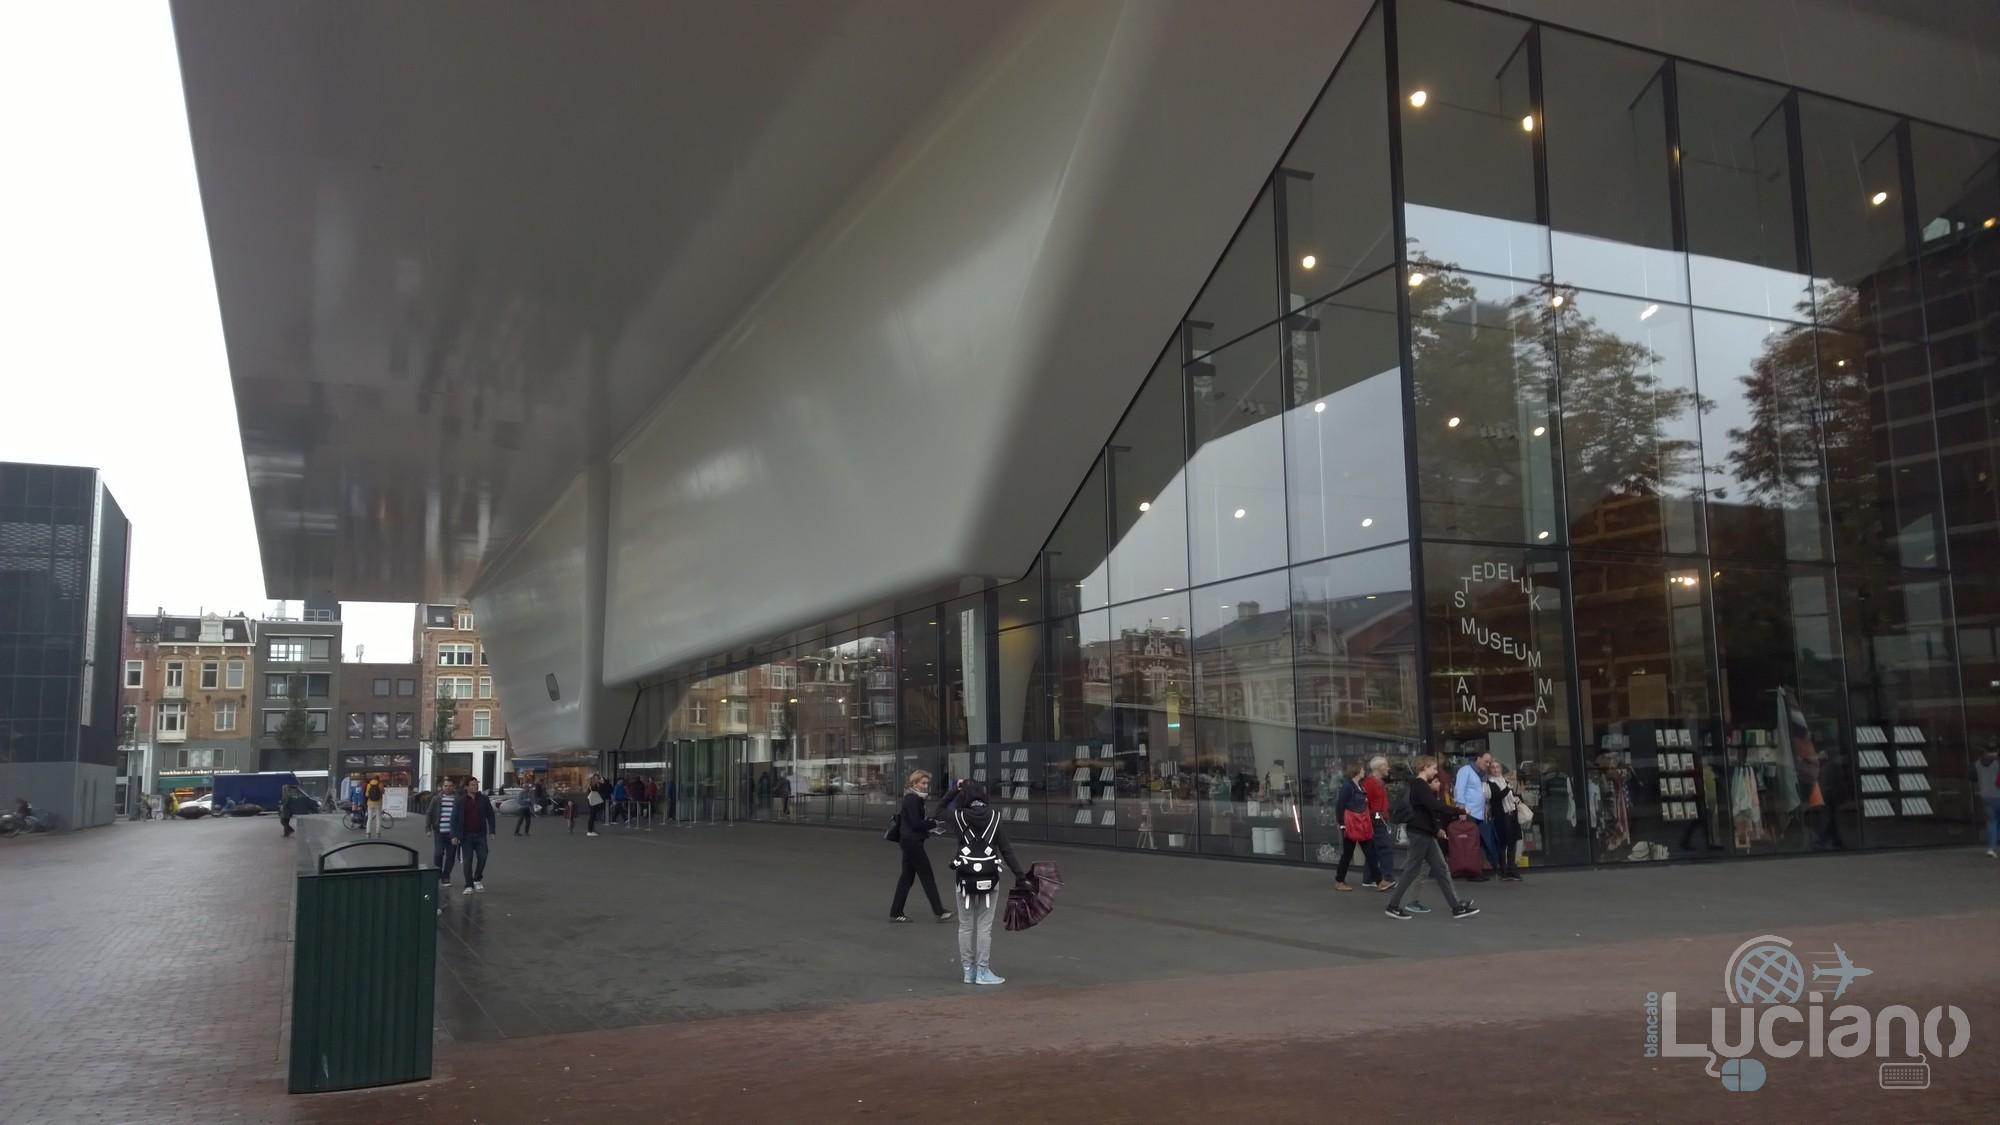 amsterdam-2014-vueling-lucianoblancatoit (196)